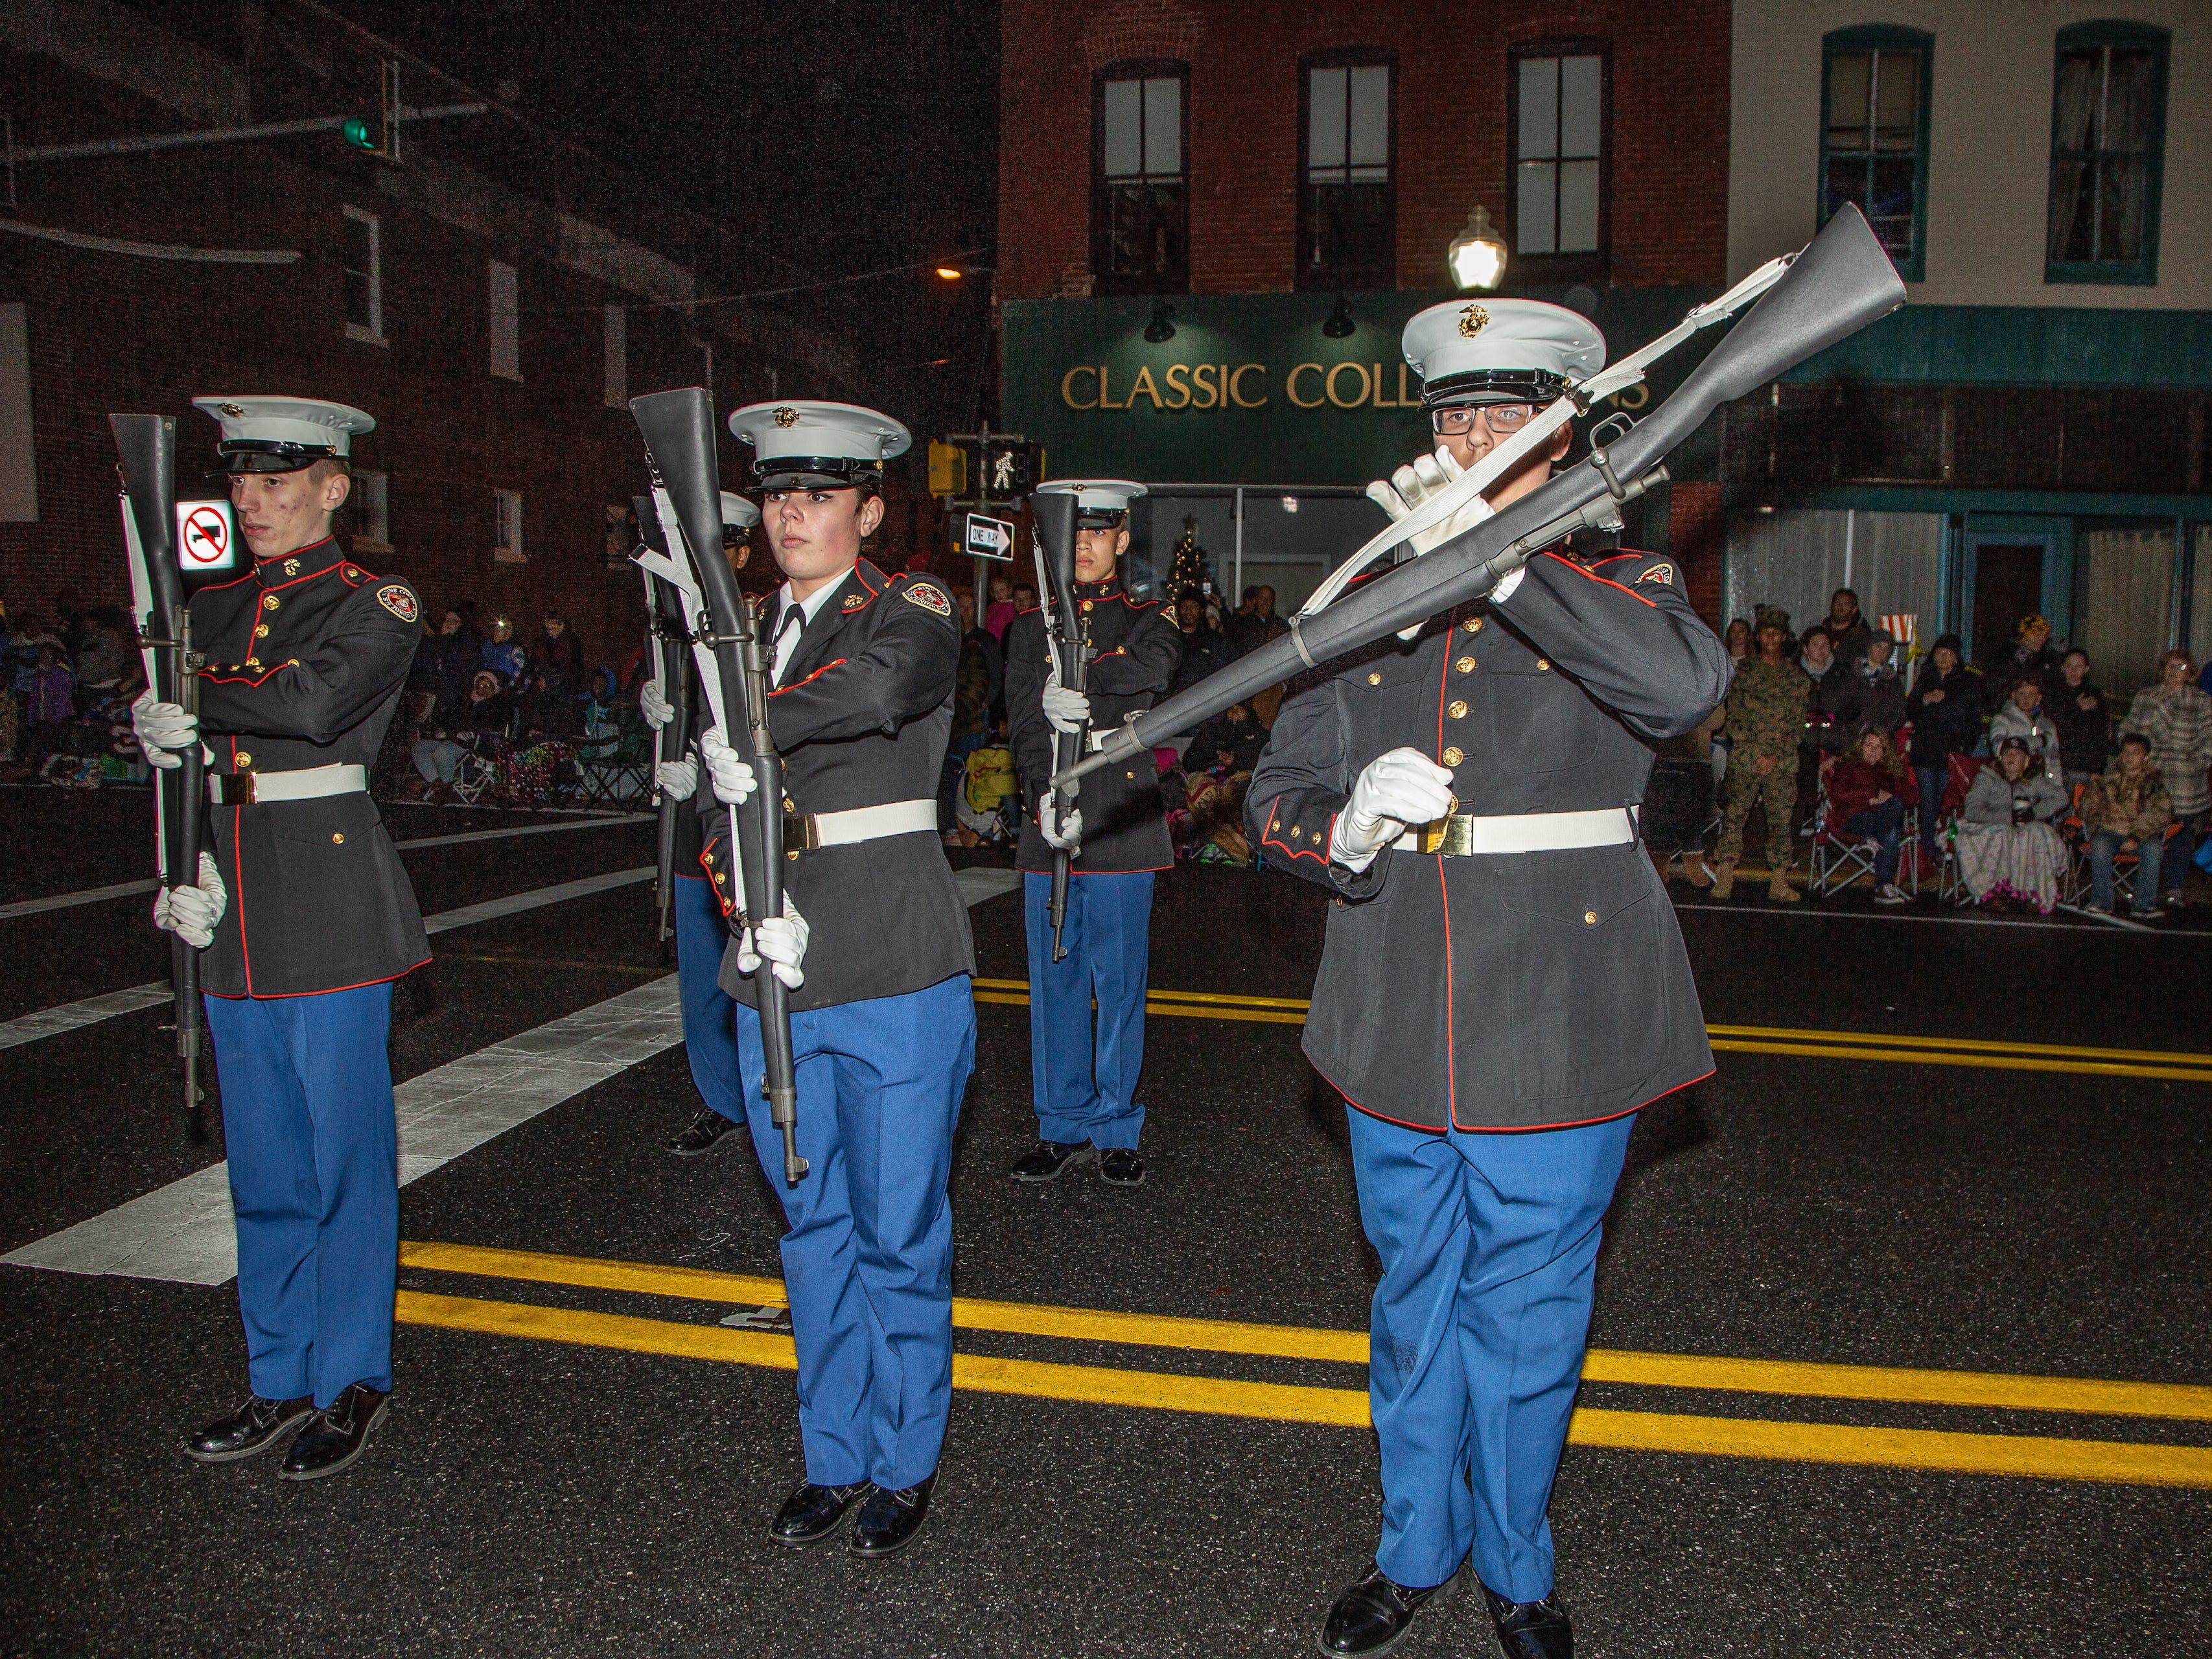 Pocomoke High School ROTC unit performs during the annual Christmas parade Nov. 26.